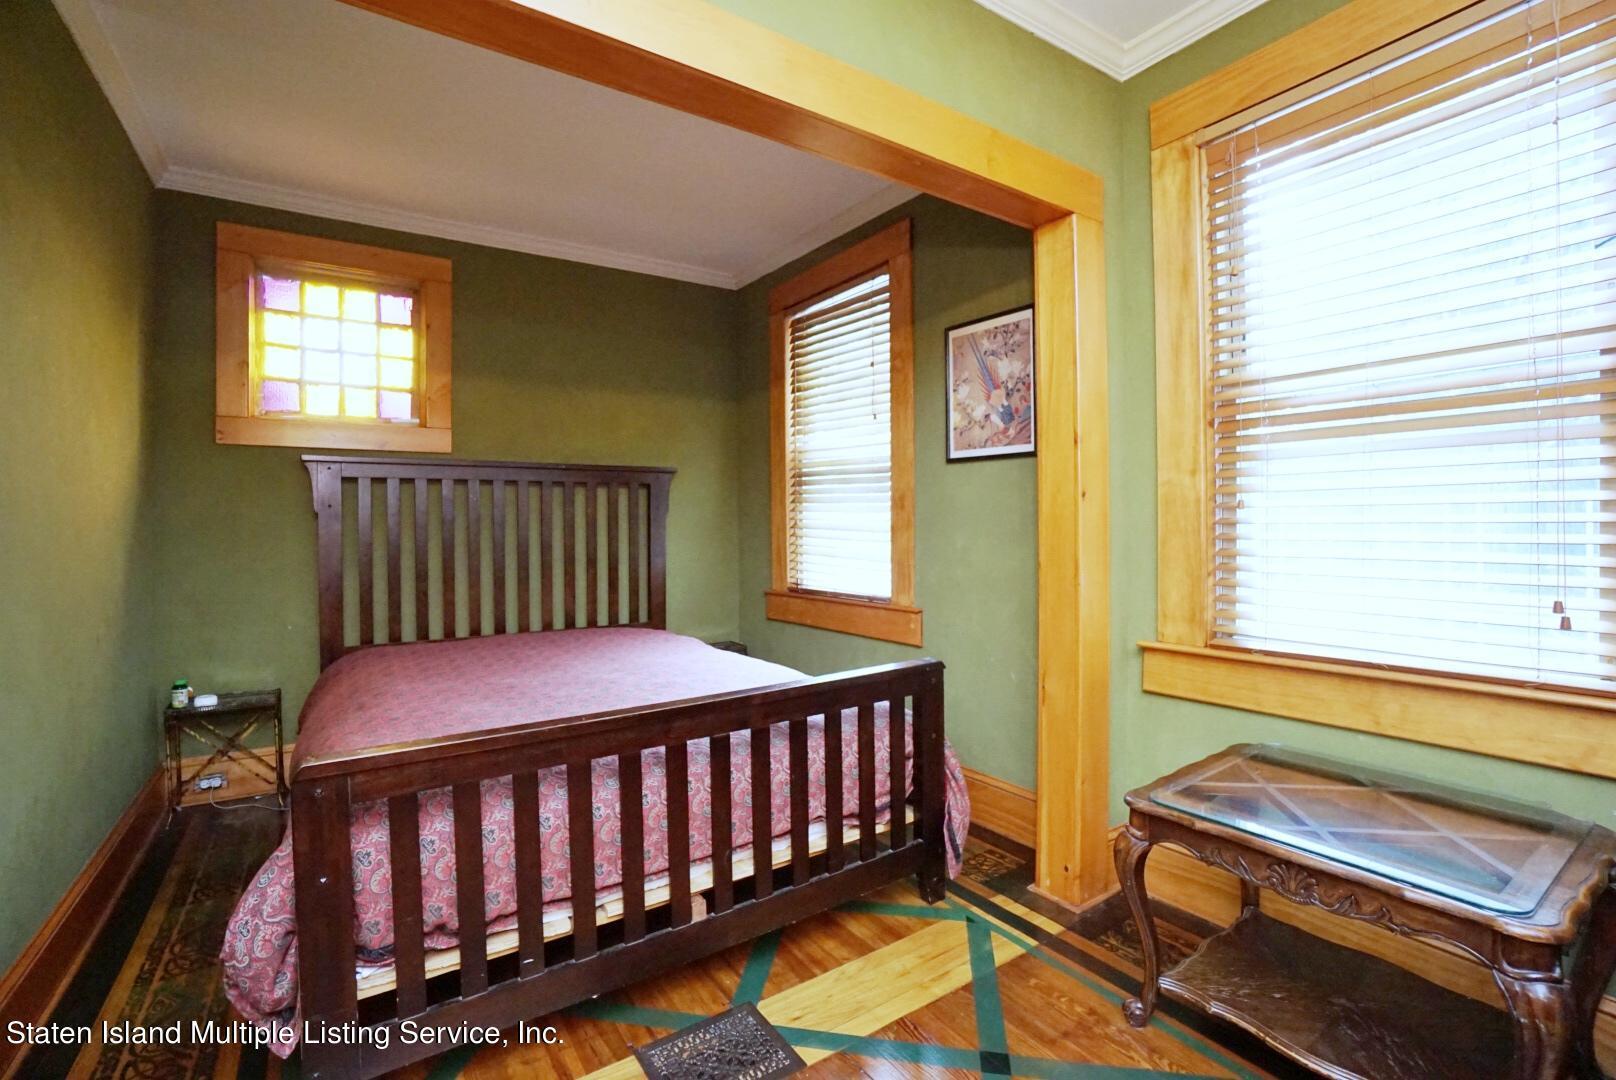 Single Family - Detached 136 York Avenue  Staten Island, NY 10301, MLS-1147575-30